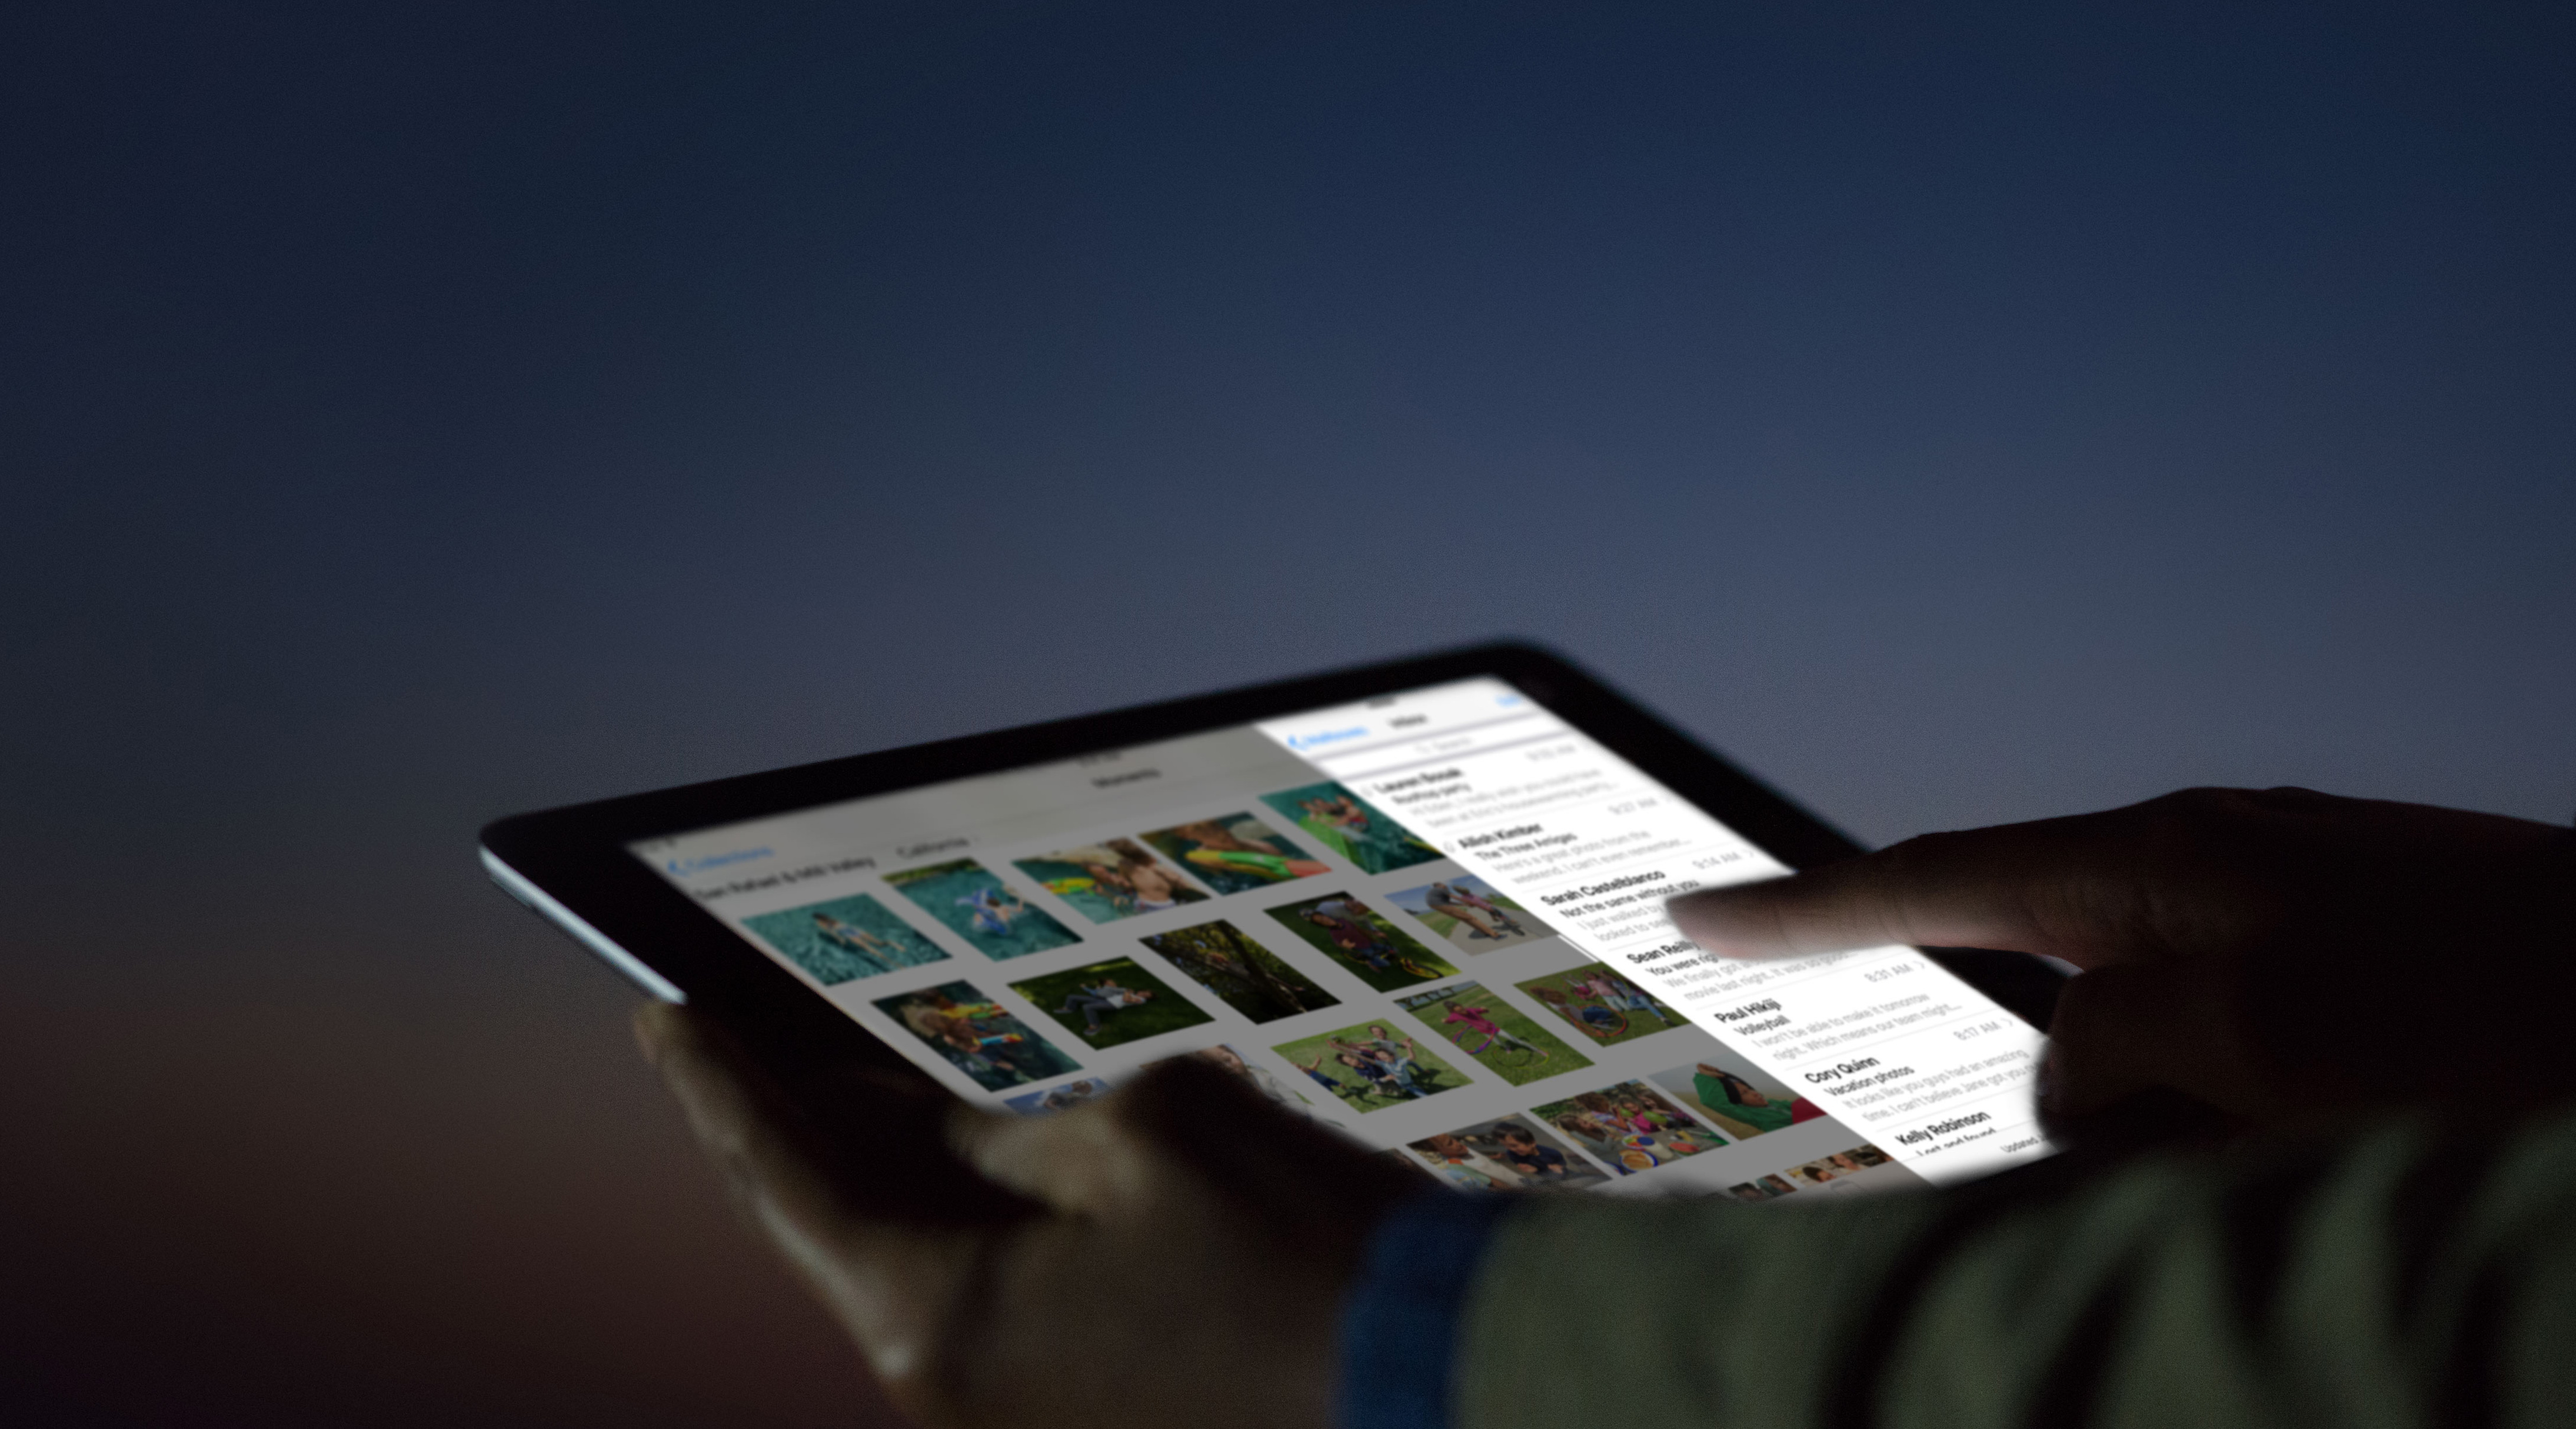 Recurso Night Shift do iOS 9.3